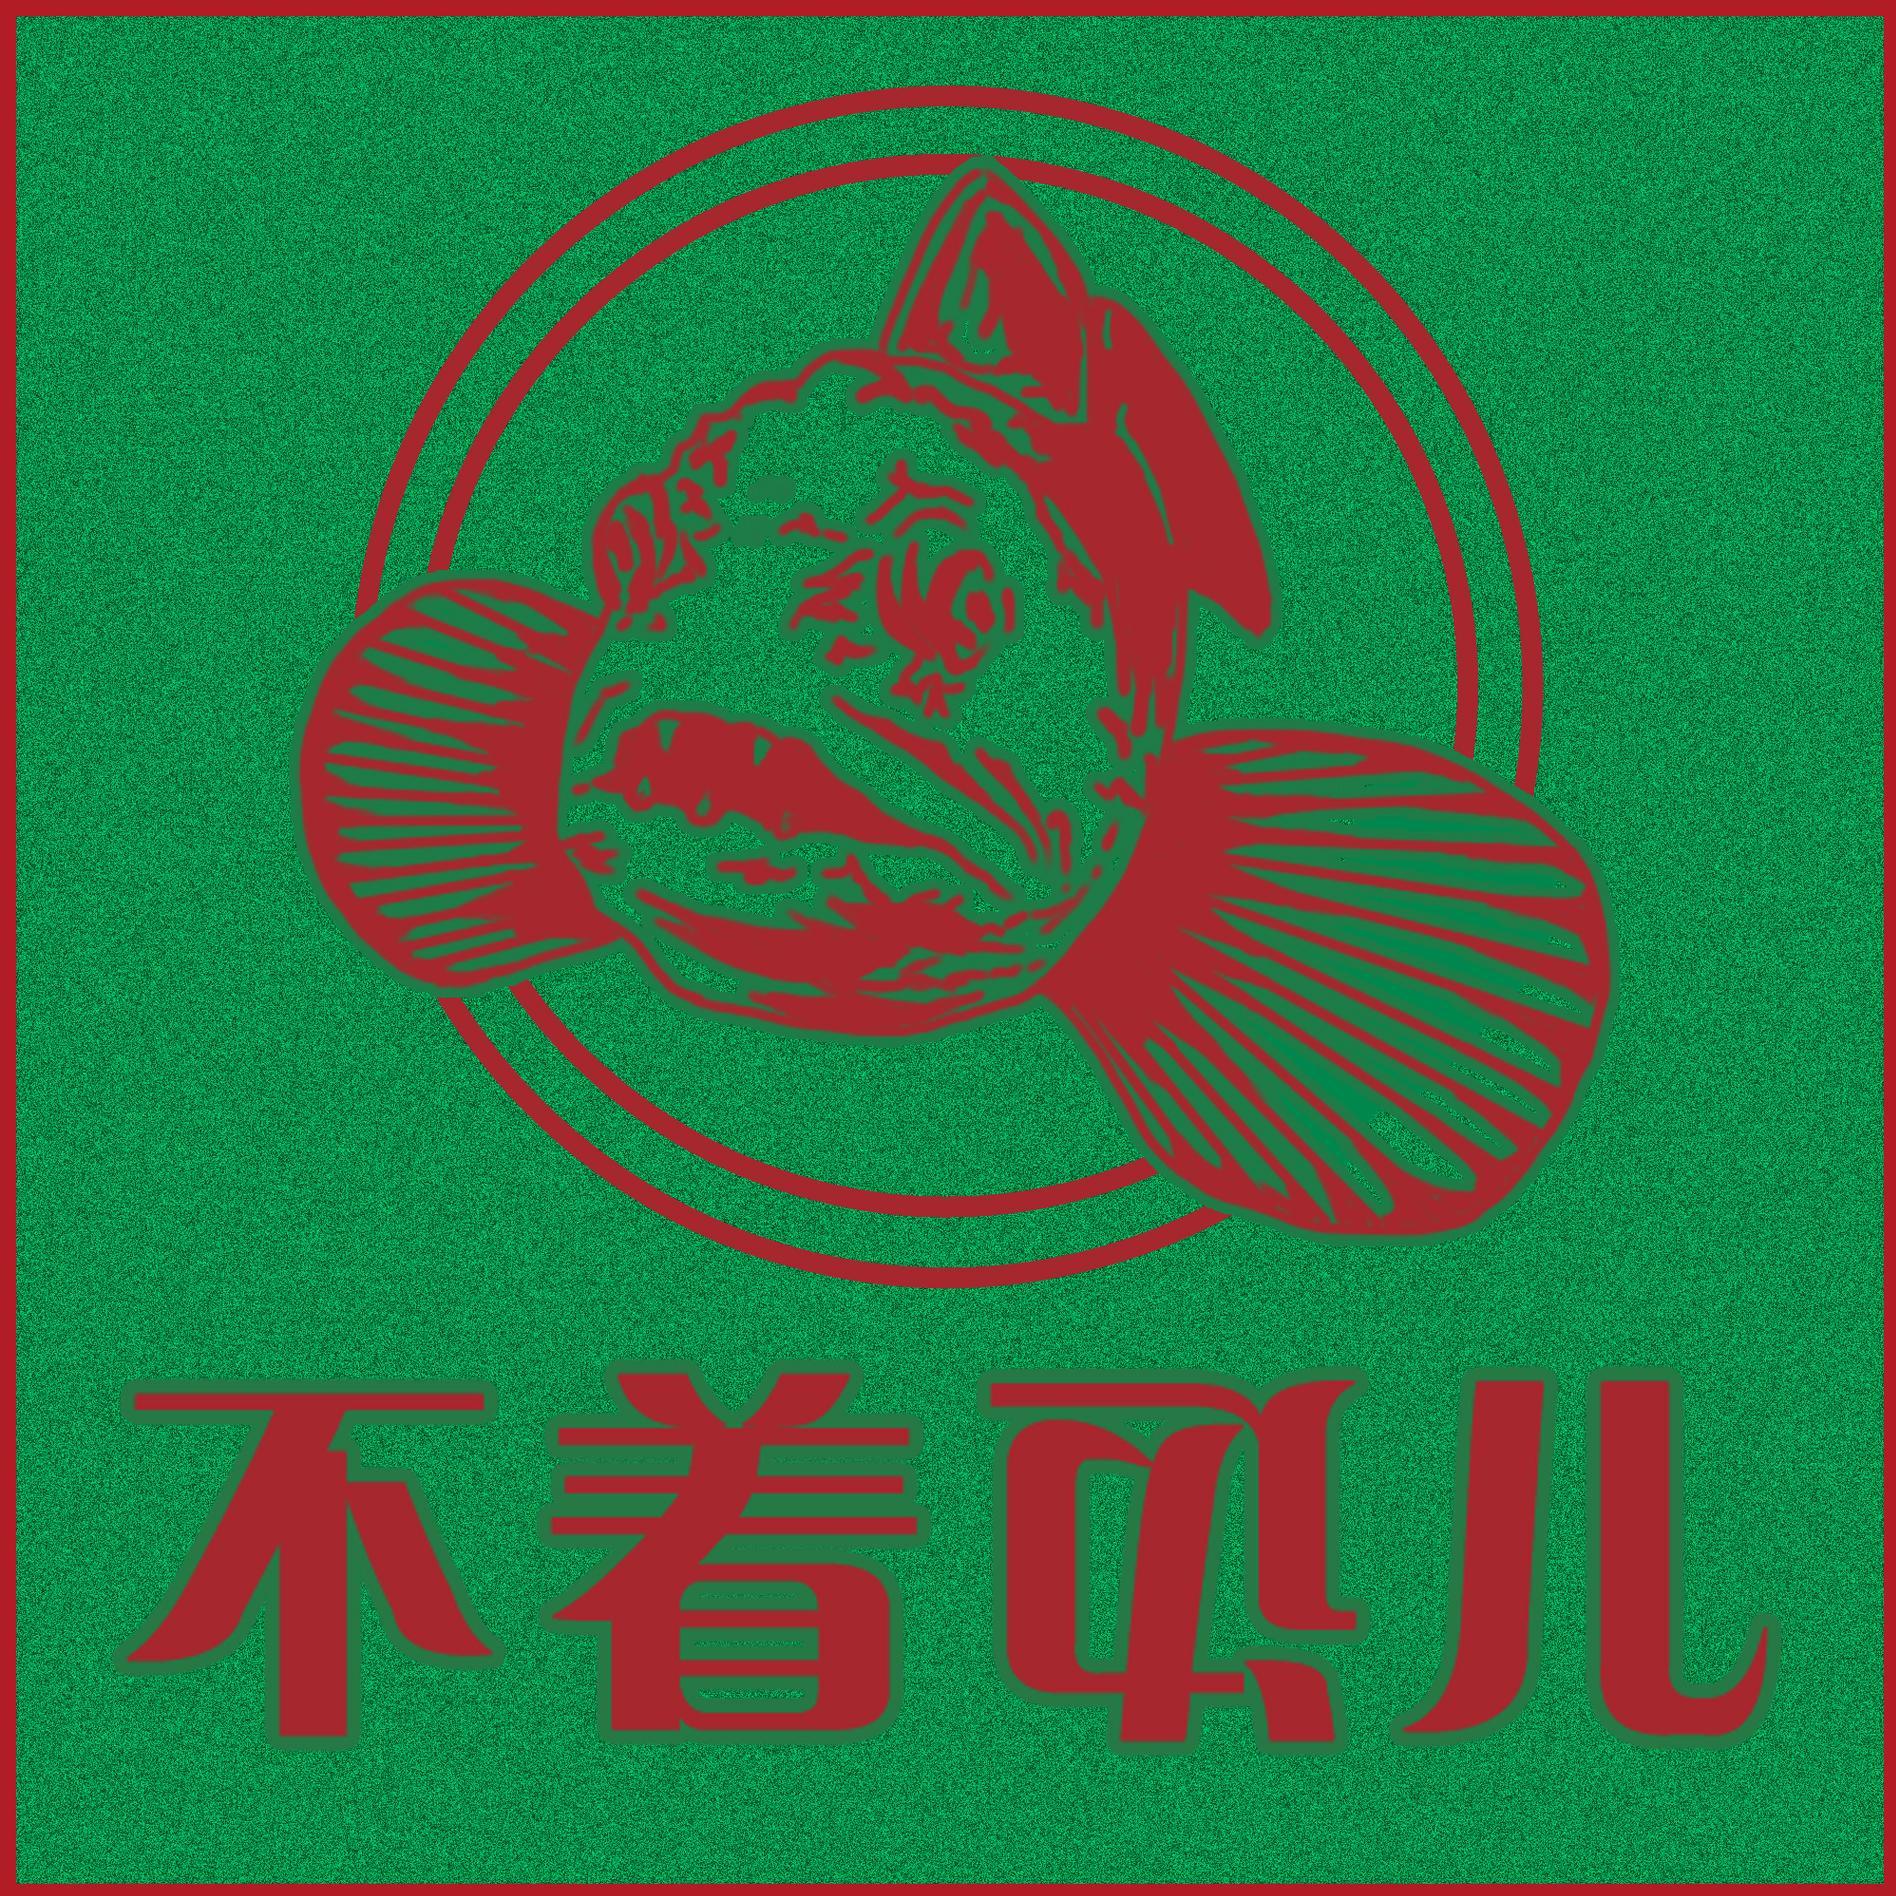 <![CDATA[不着边儿FM]]>